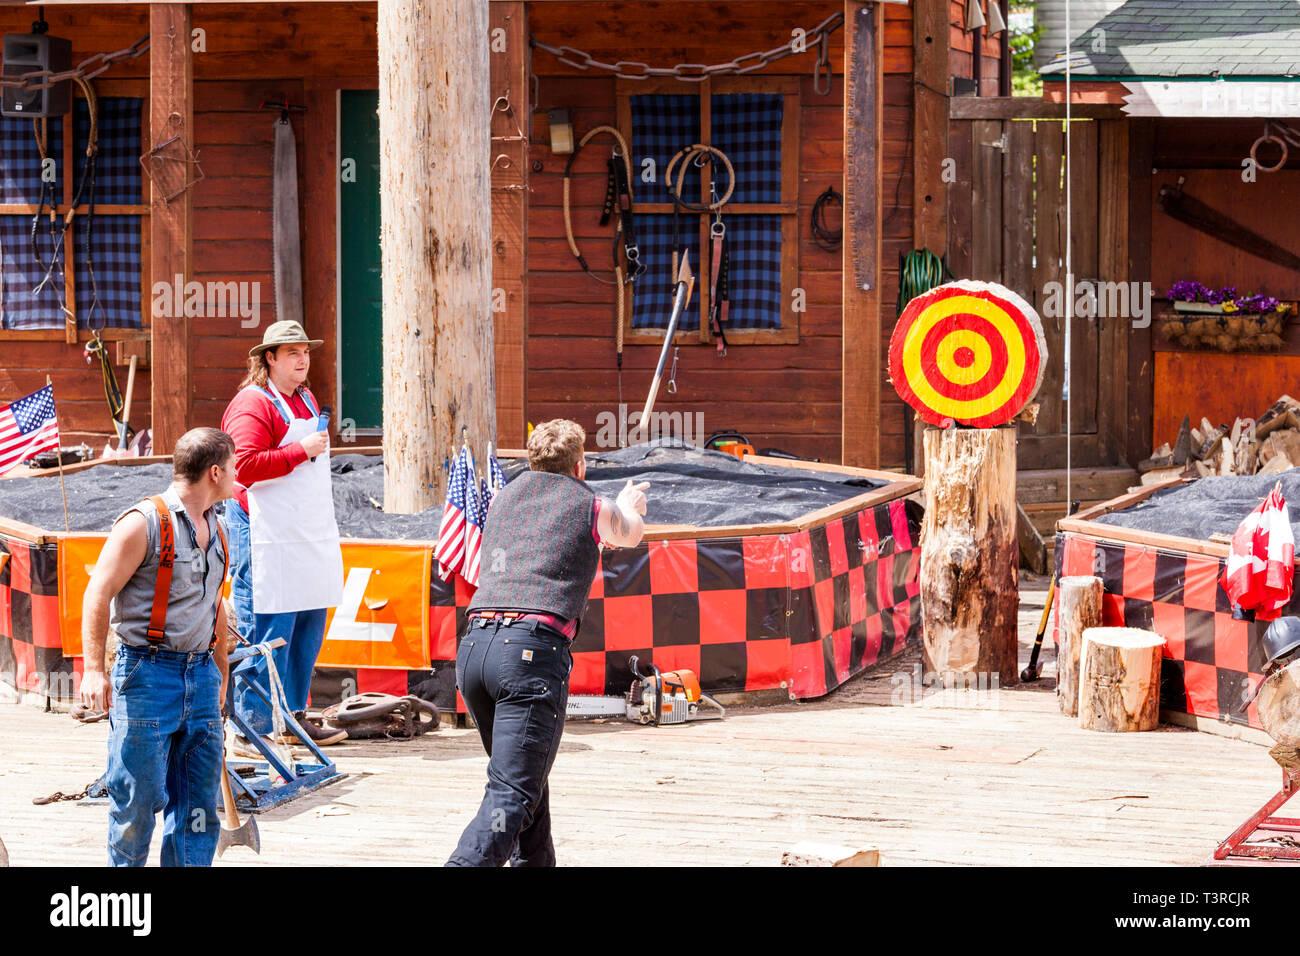 Axe throwing demonstration at the Great Alaskan Lumberjack Show in Ketchikan, Alaska USA Stock Photo